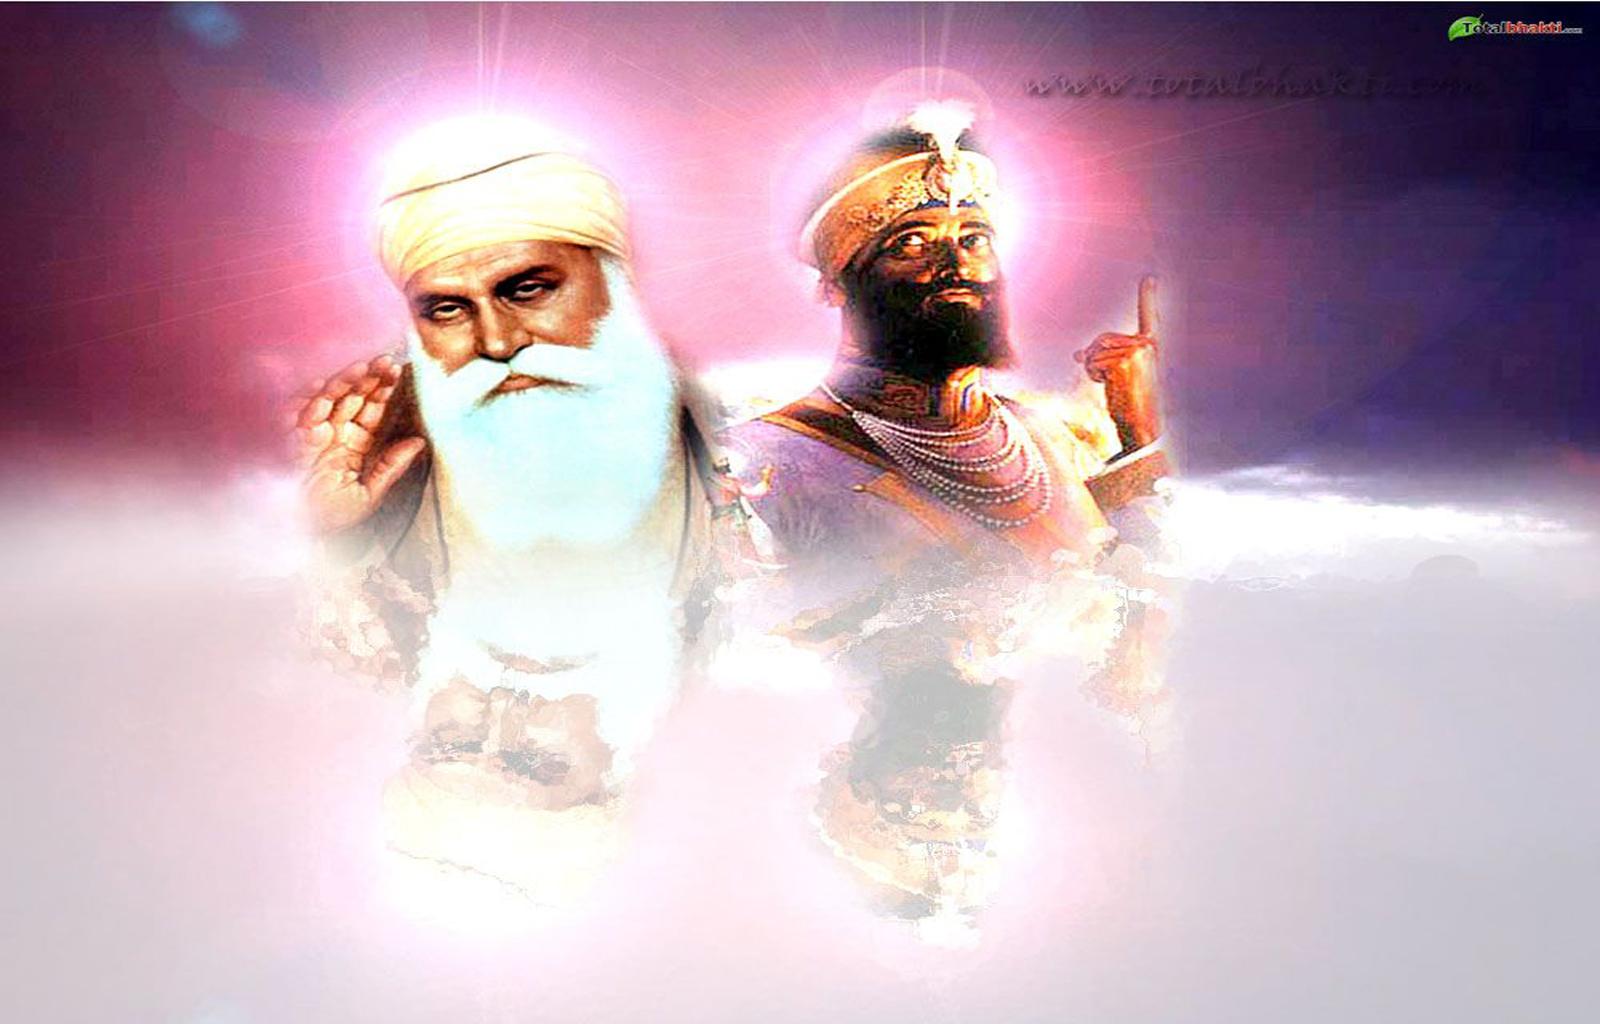 Download Sikh Wallpapers Wallpaper Wallpaper Hd Background Desktop